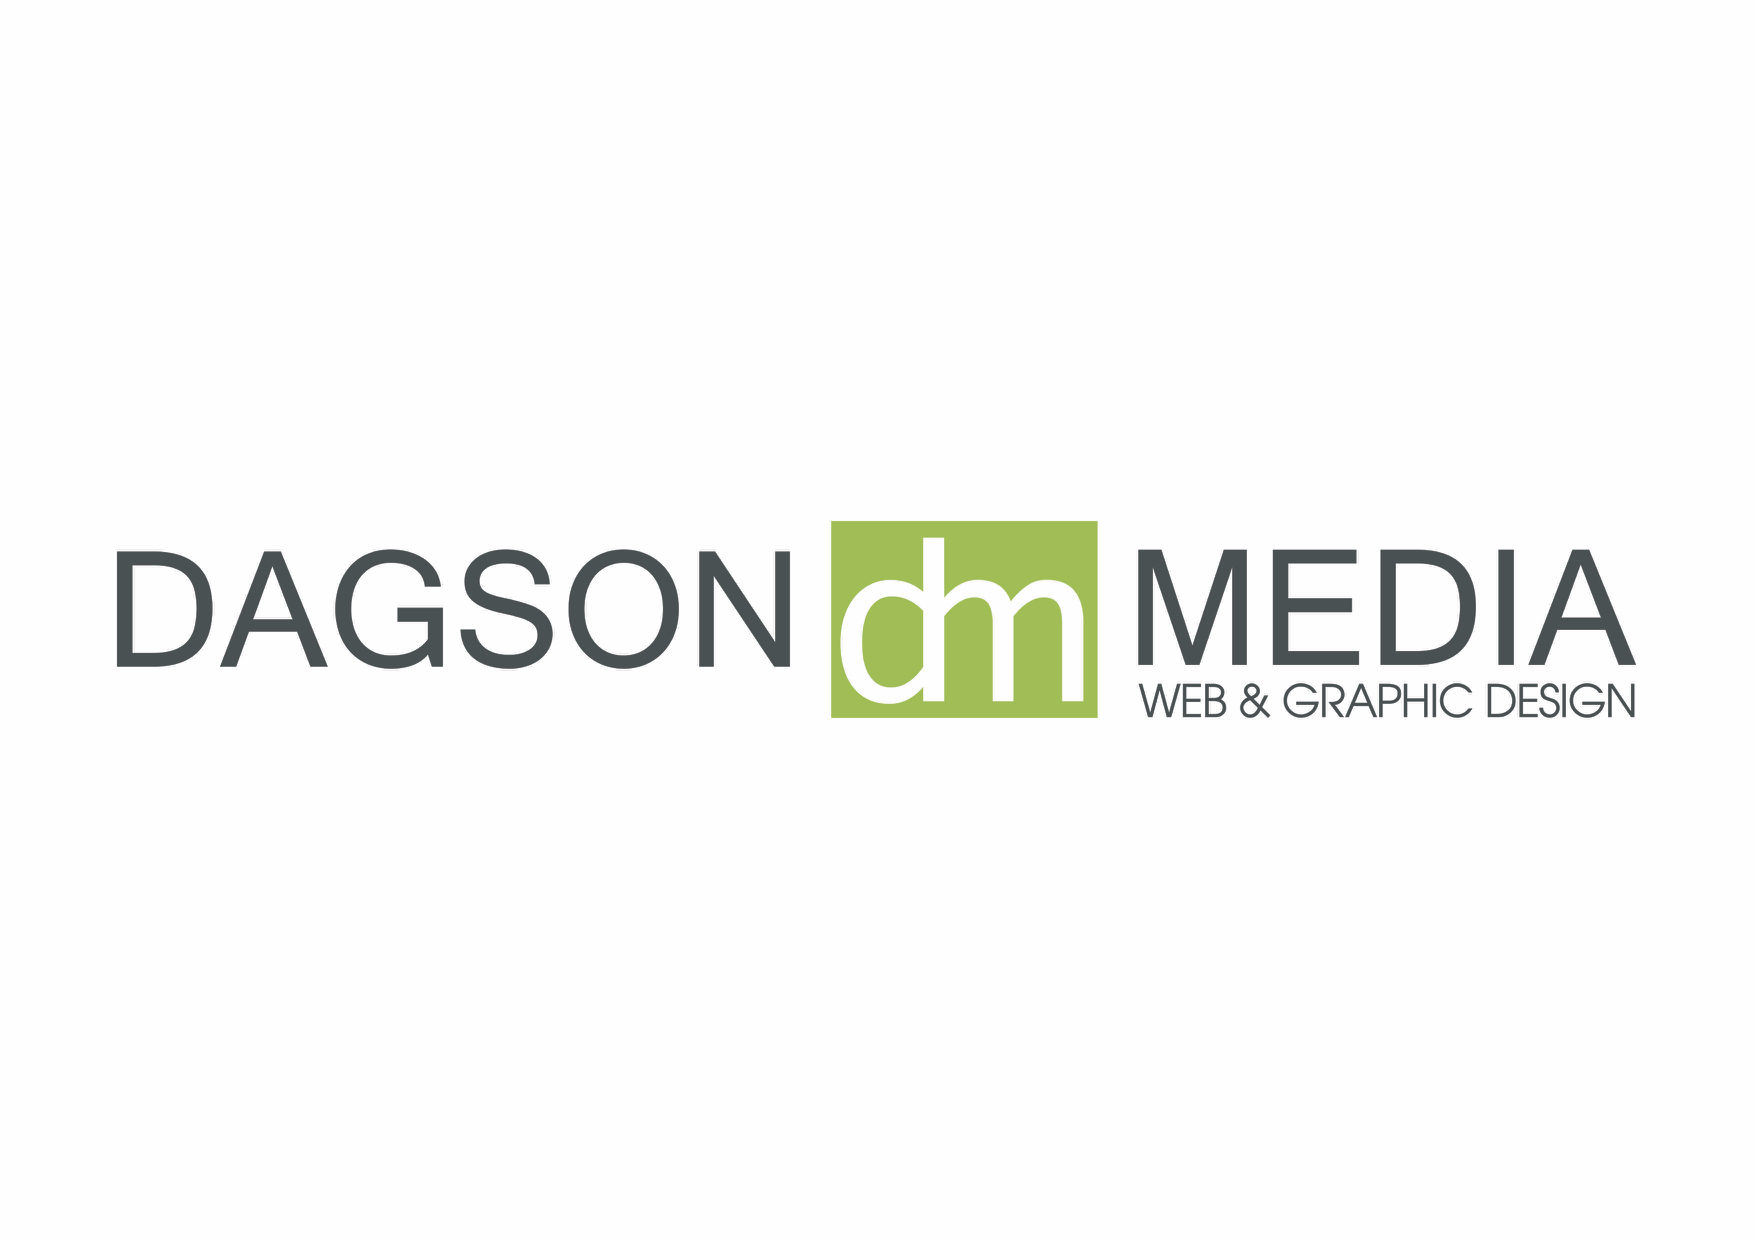 dagsonmedia